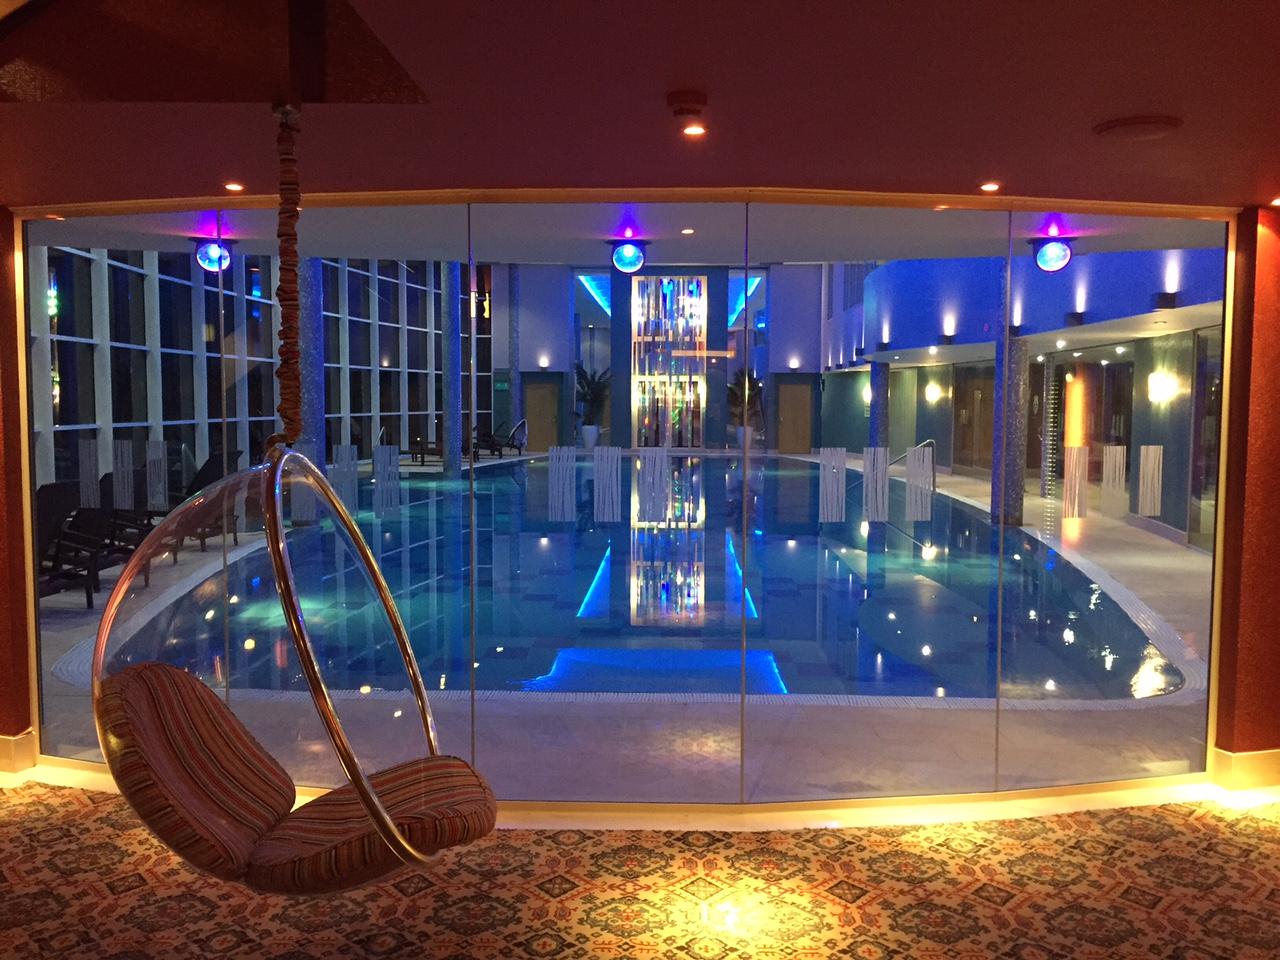 Stobo Castle Luxury Spa Review